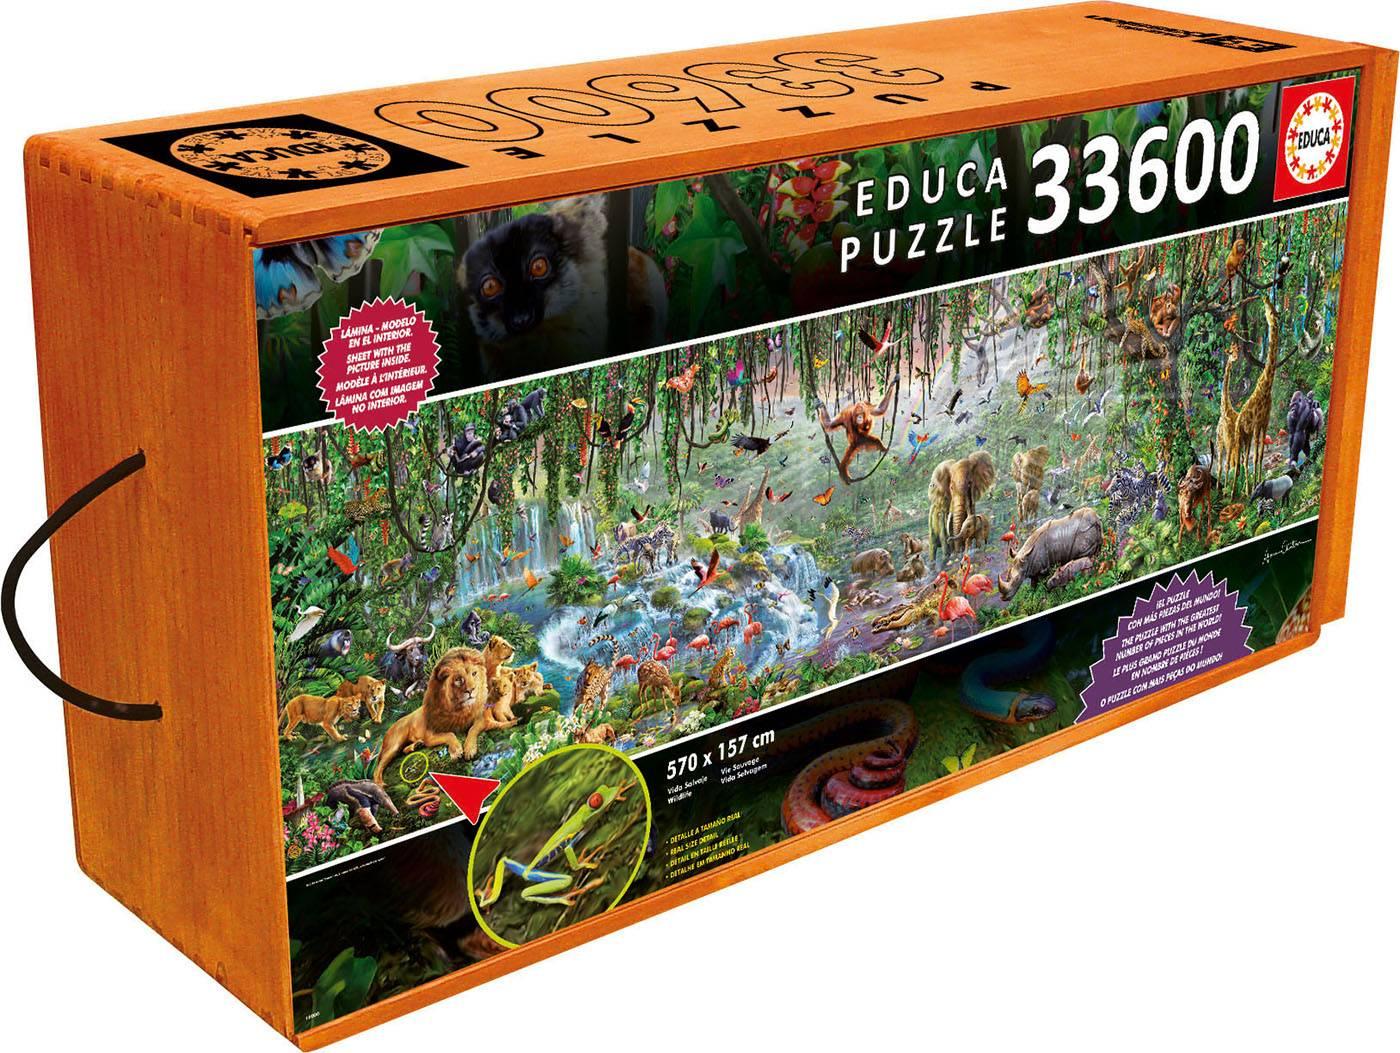 Puzzle xxl - La vie sauvage 33600 pièces--Educa